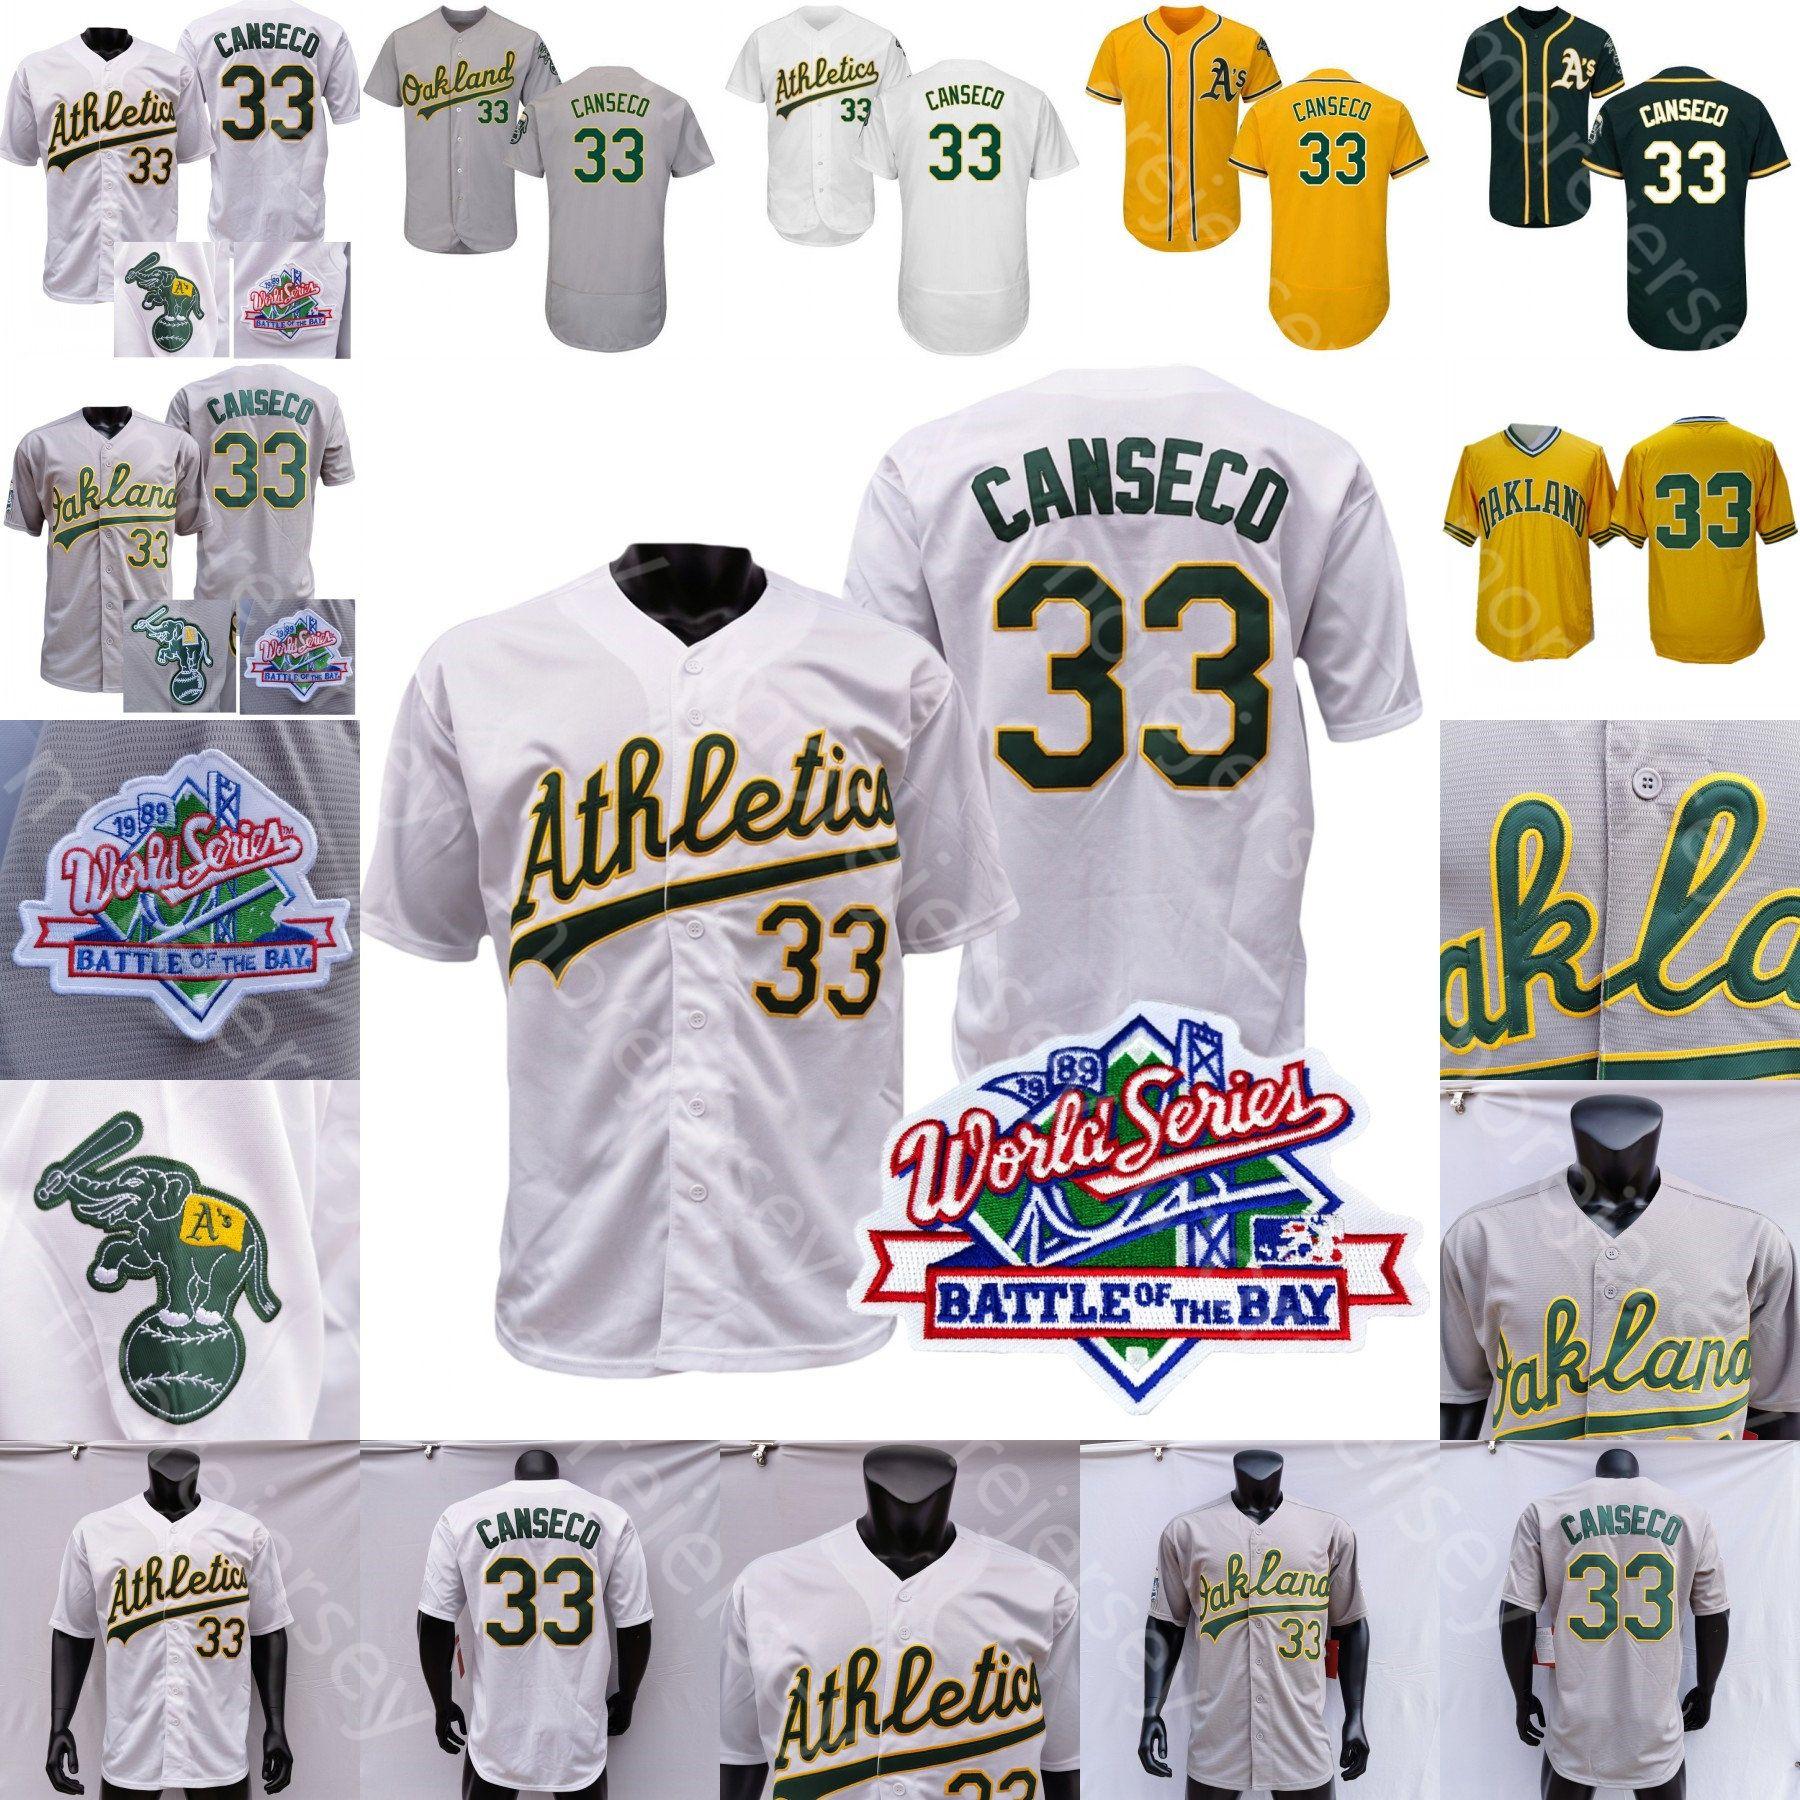 Хосе Кансеко Джерси 1989 WS Бейсбол Oakland Трикотажные Home Away Белый Серый Желтый пуловер Все Sttiched и вышивке Мужчины Размер M-3XL